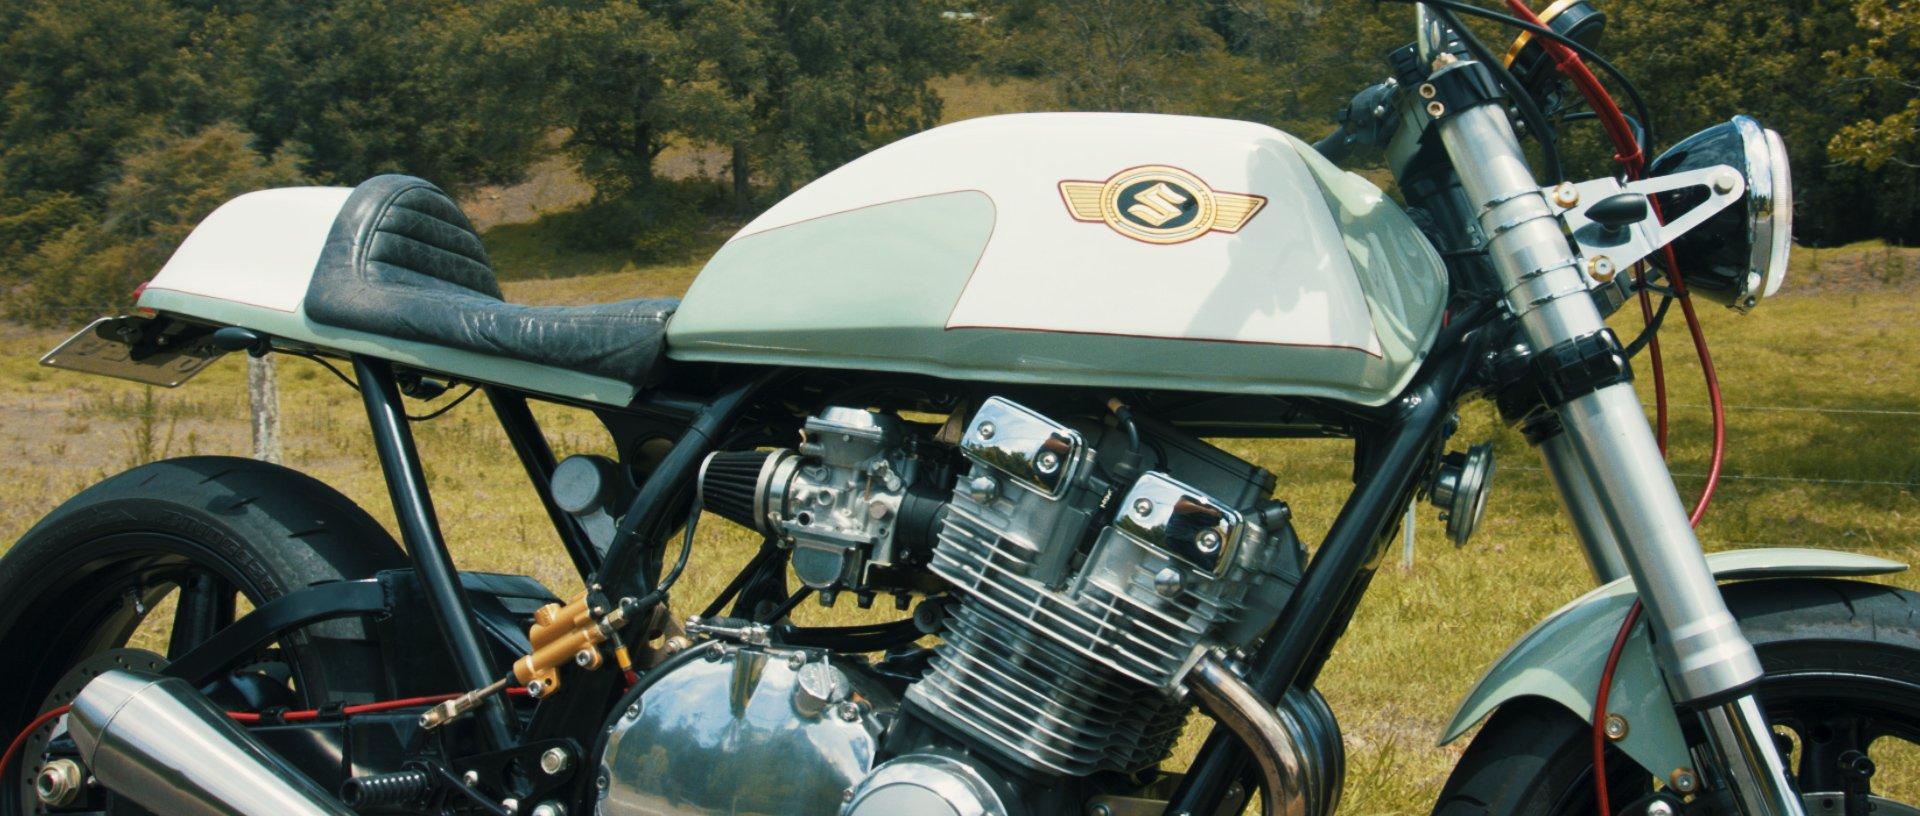 SDG moto motorcycle documentary